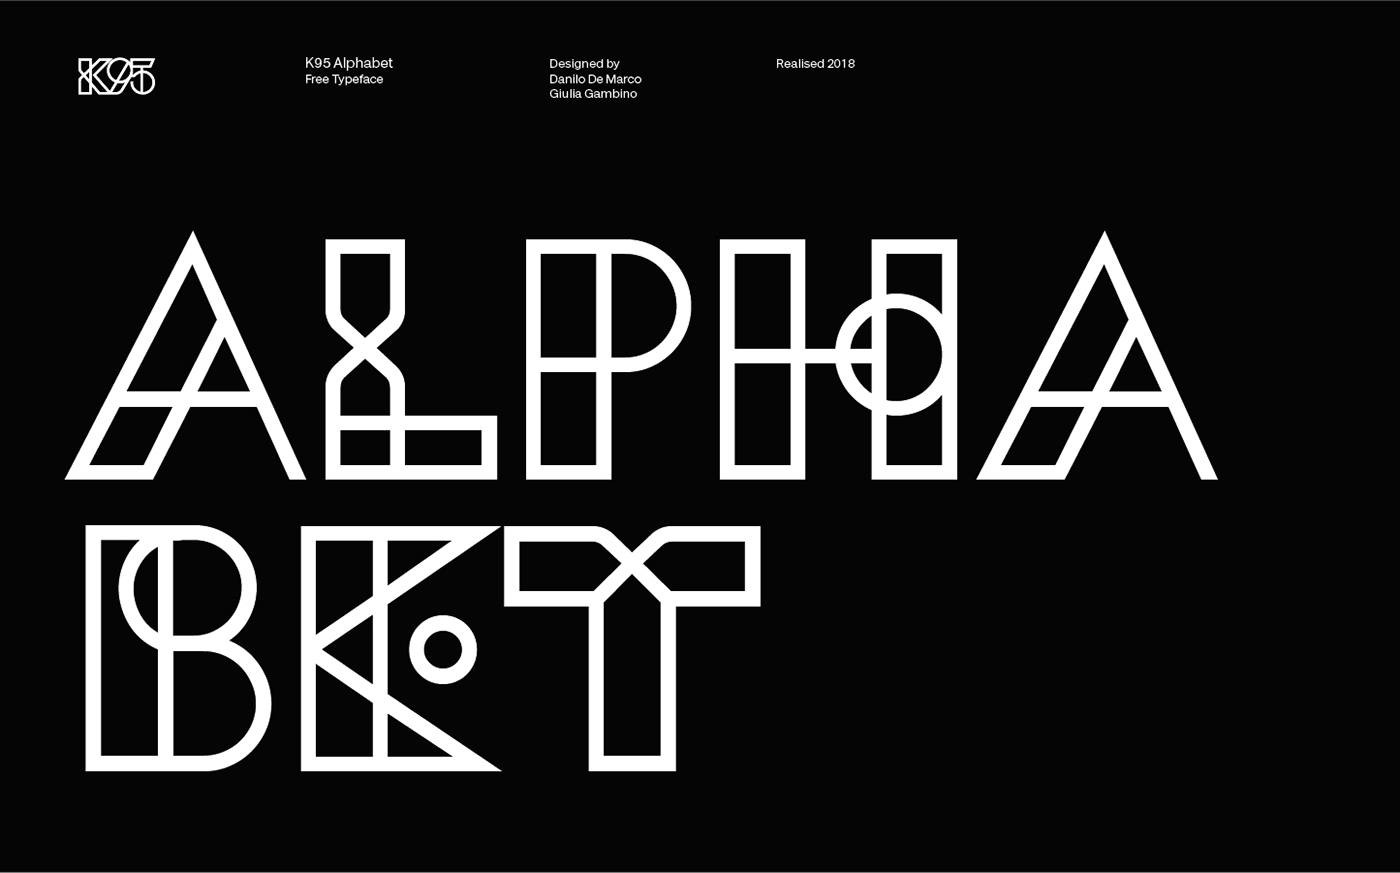 K95 Alphabet Typeface